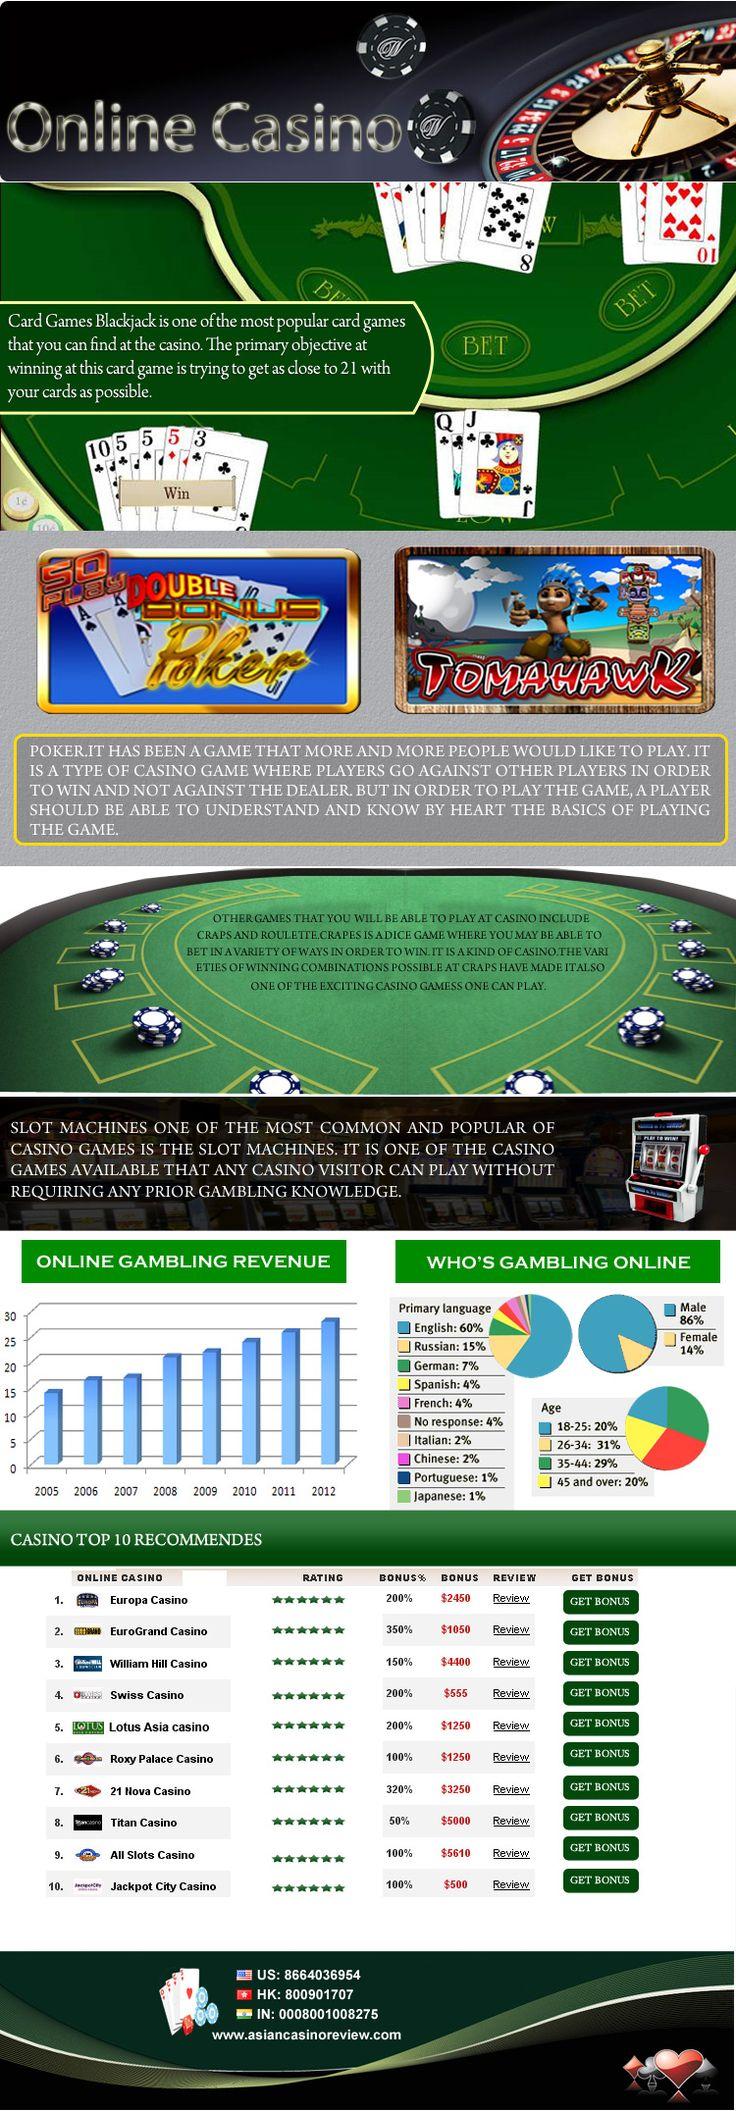 Top online casinos featuring best mobile casino, online slots and no deposit casino bonuses. Visit http://www.online-casino-info.com/ for more details